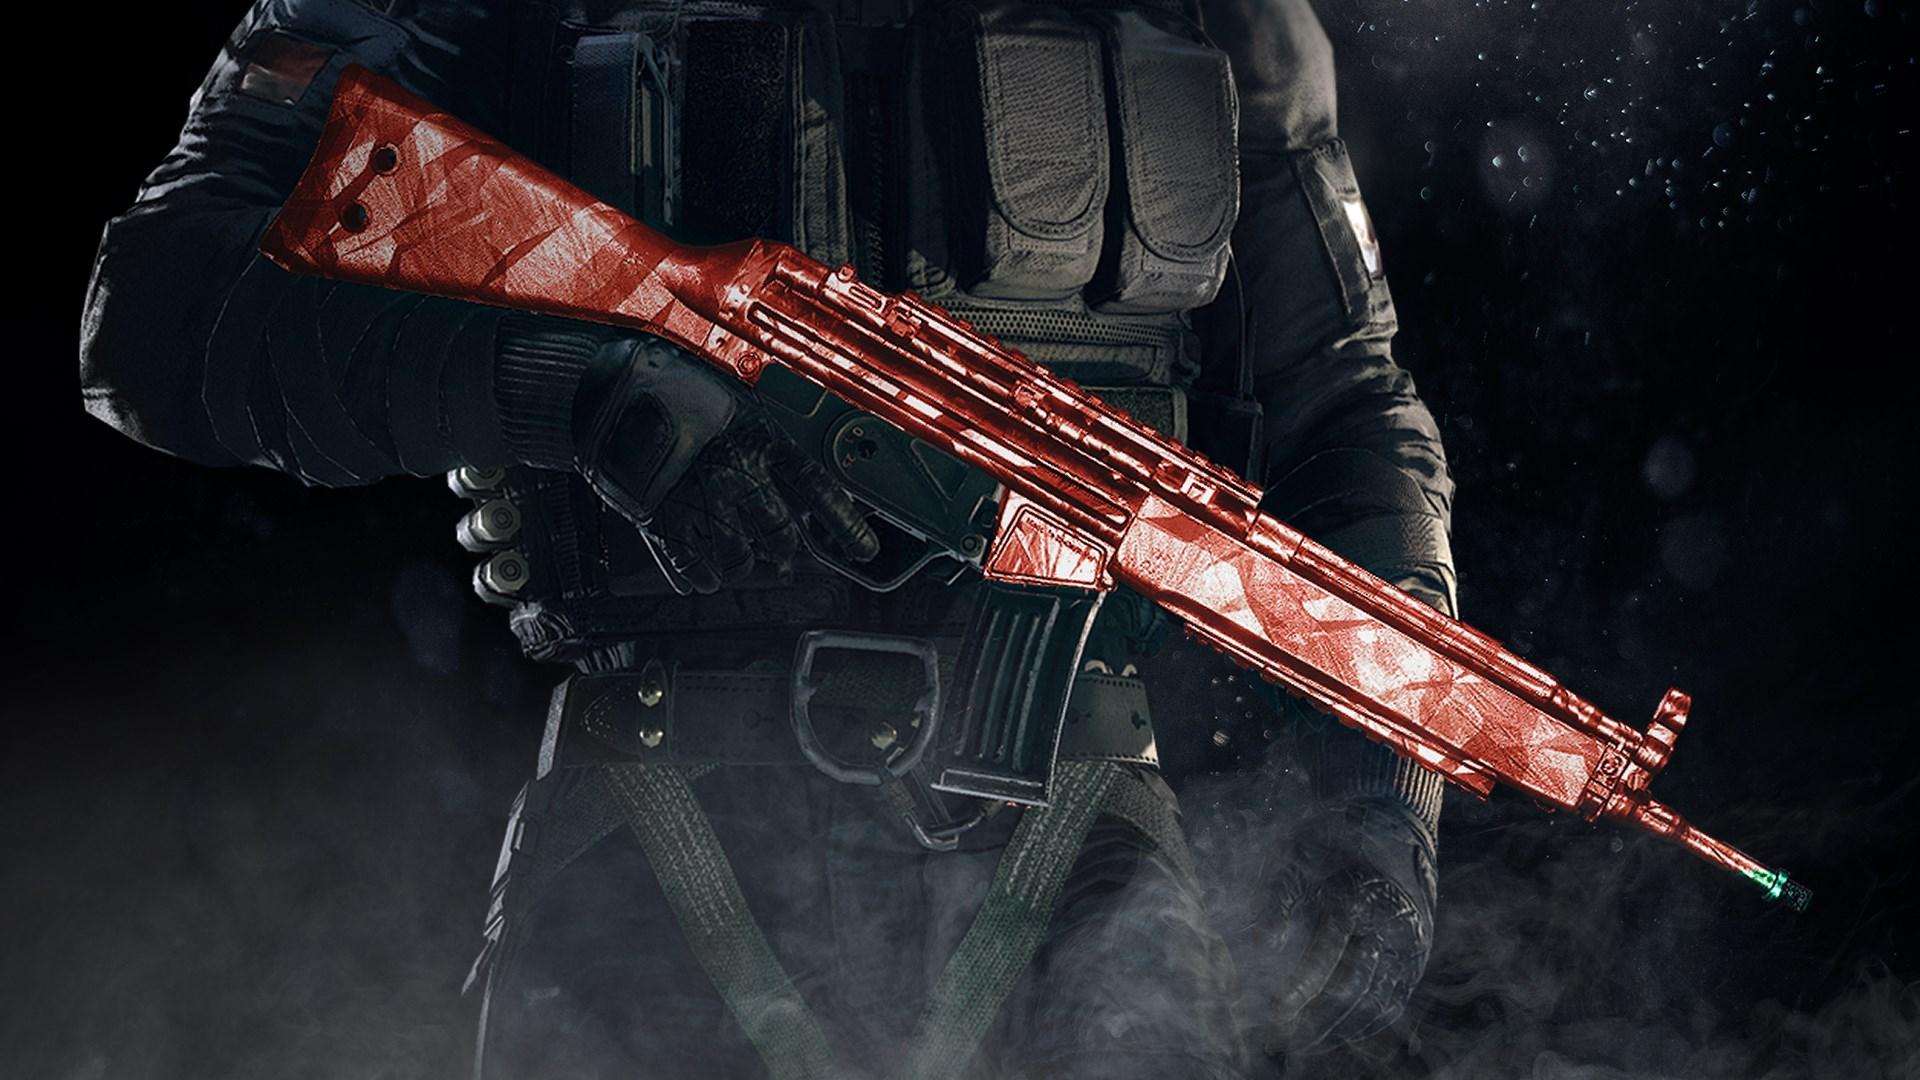 Tom Clancy's Rainbow Six Siege: Apariencia de armas Rubí